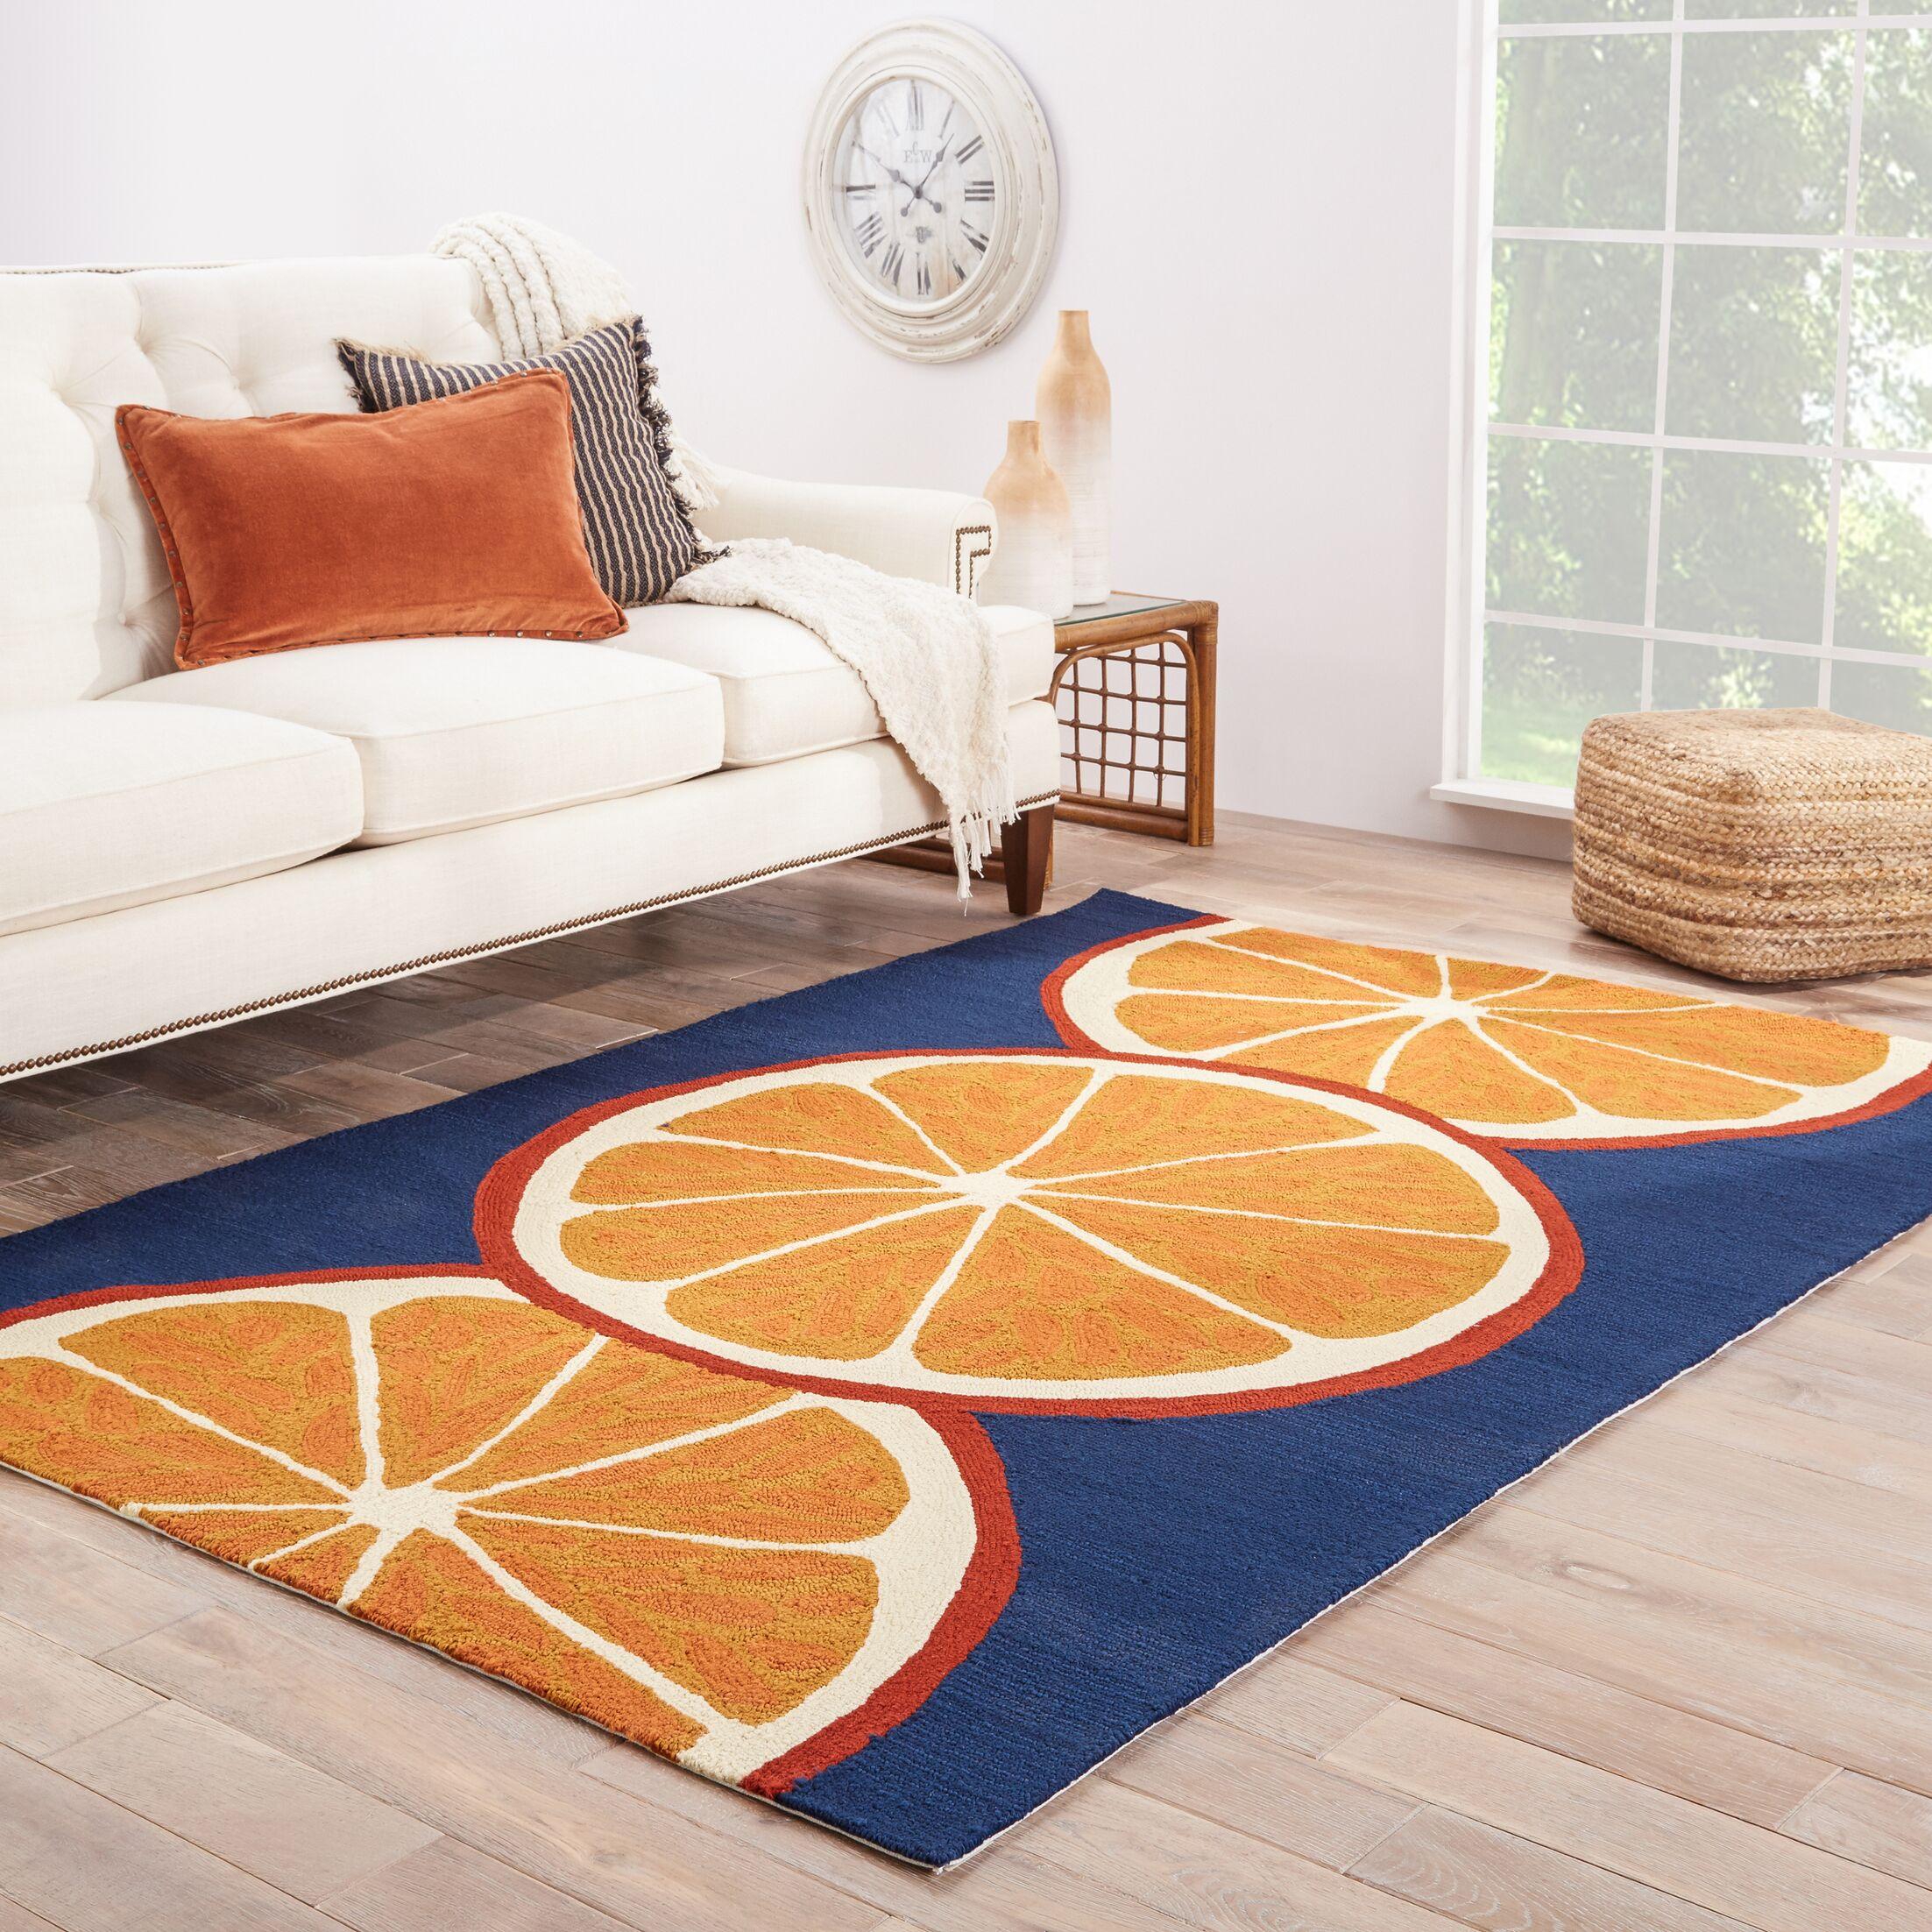 Smith Conversational Orange/Blue Indoor/Outdoor Area Rug Rug Size: Rectangle 5' x 7'6